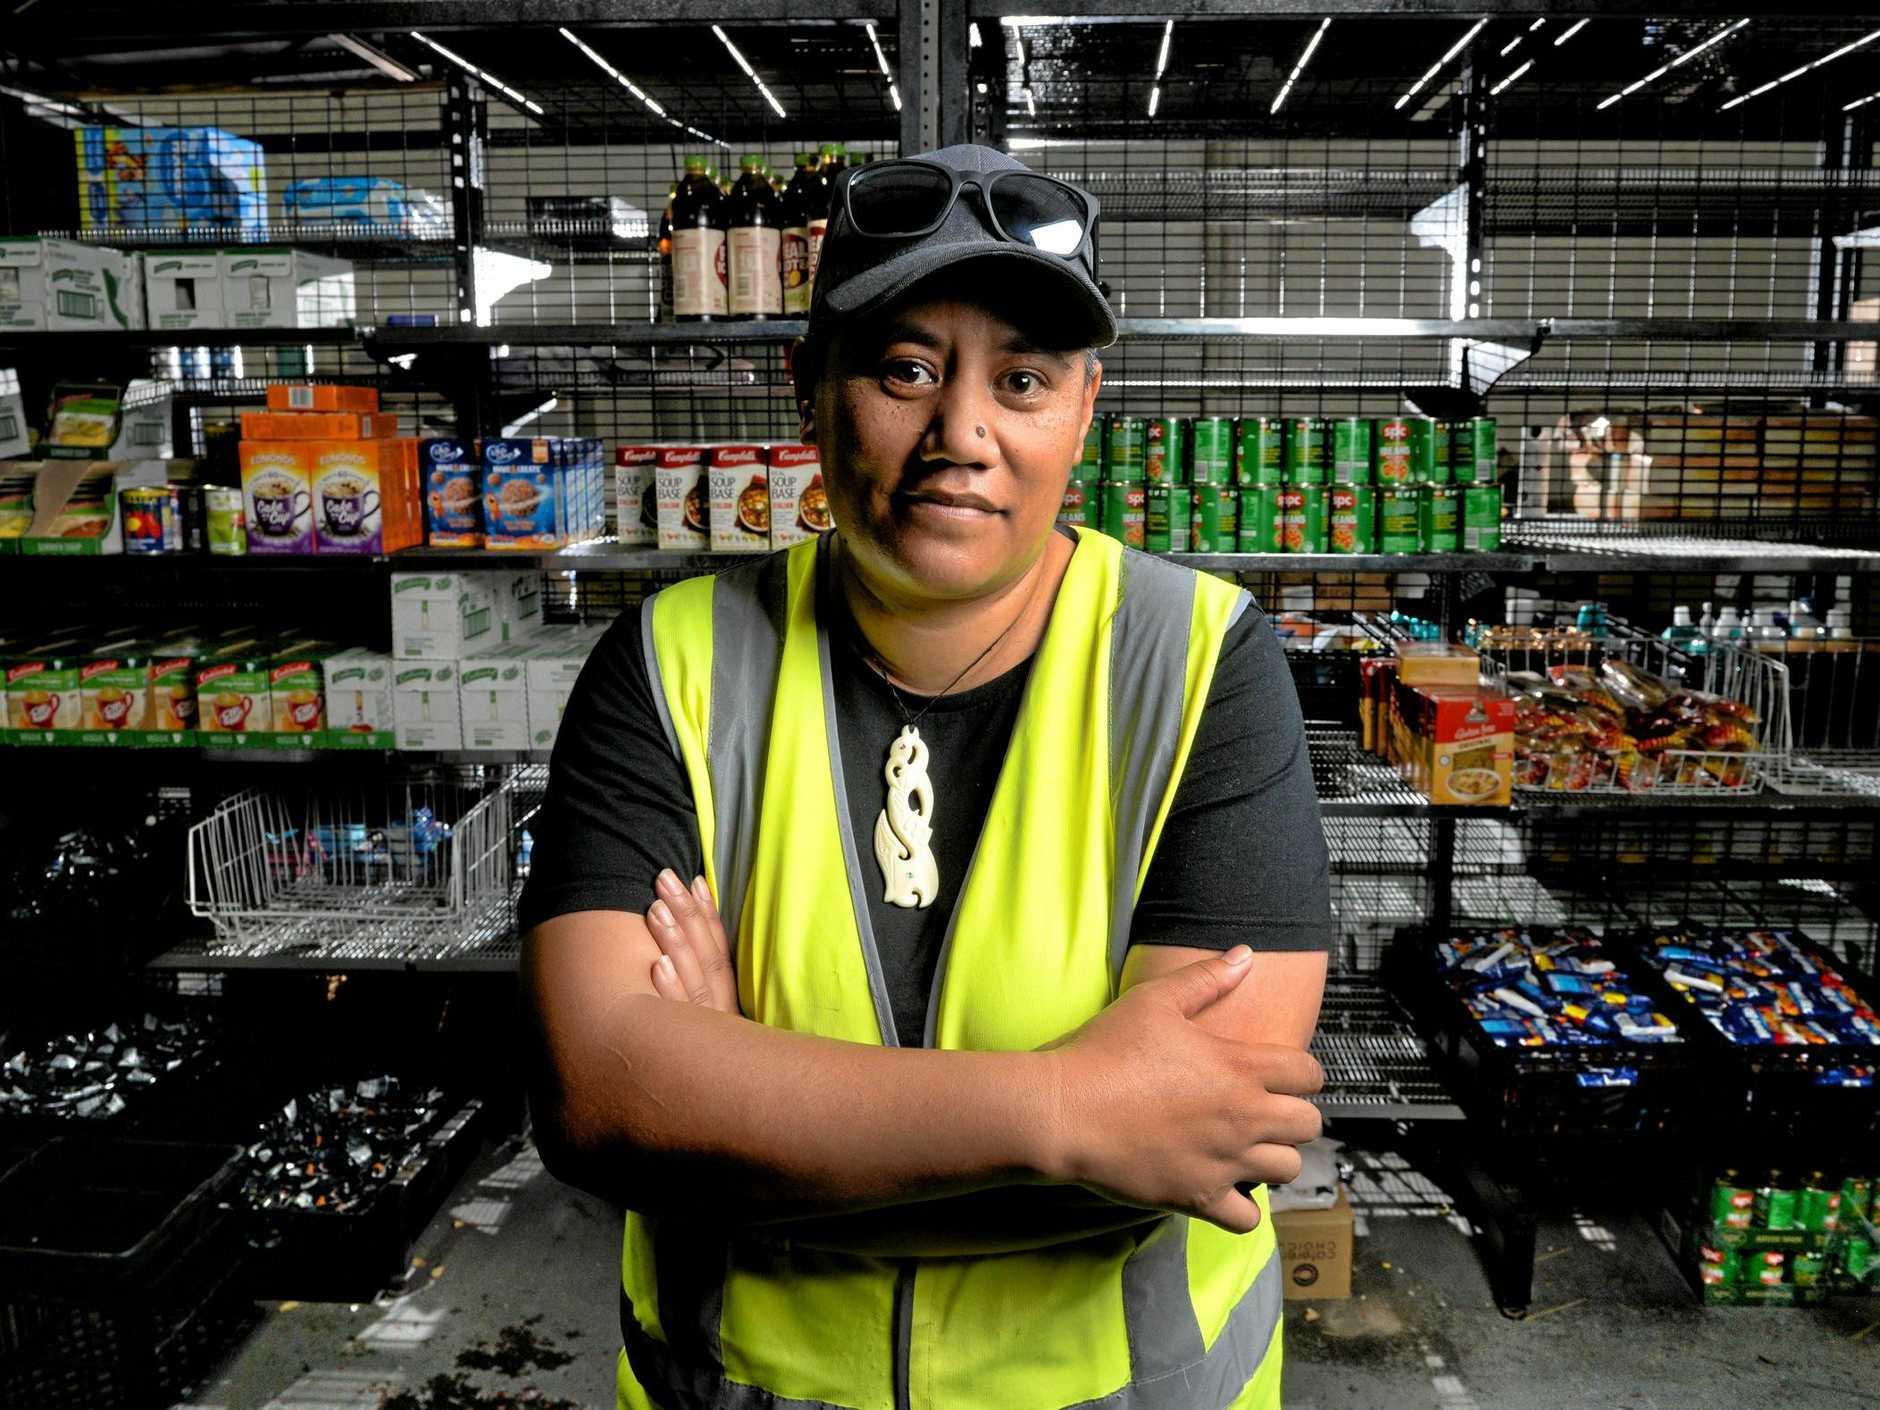 Ipswich Food Barn managing director Qim Kauwhata